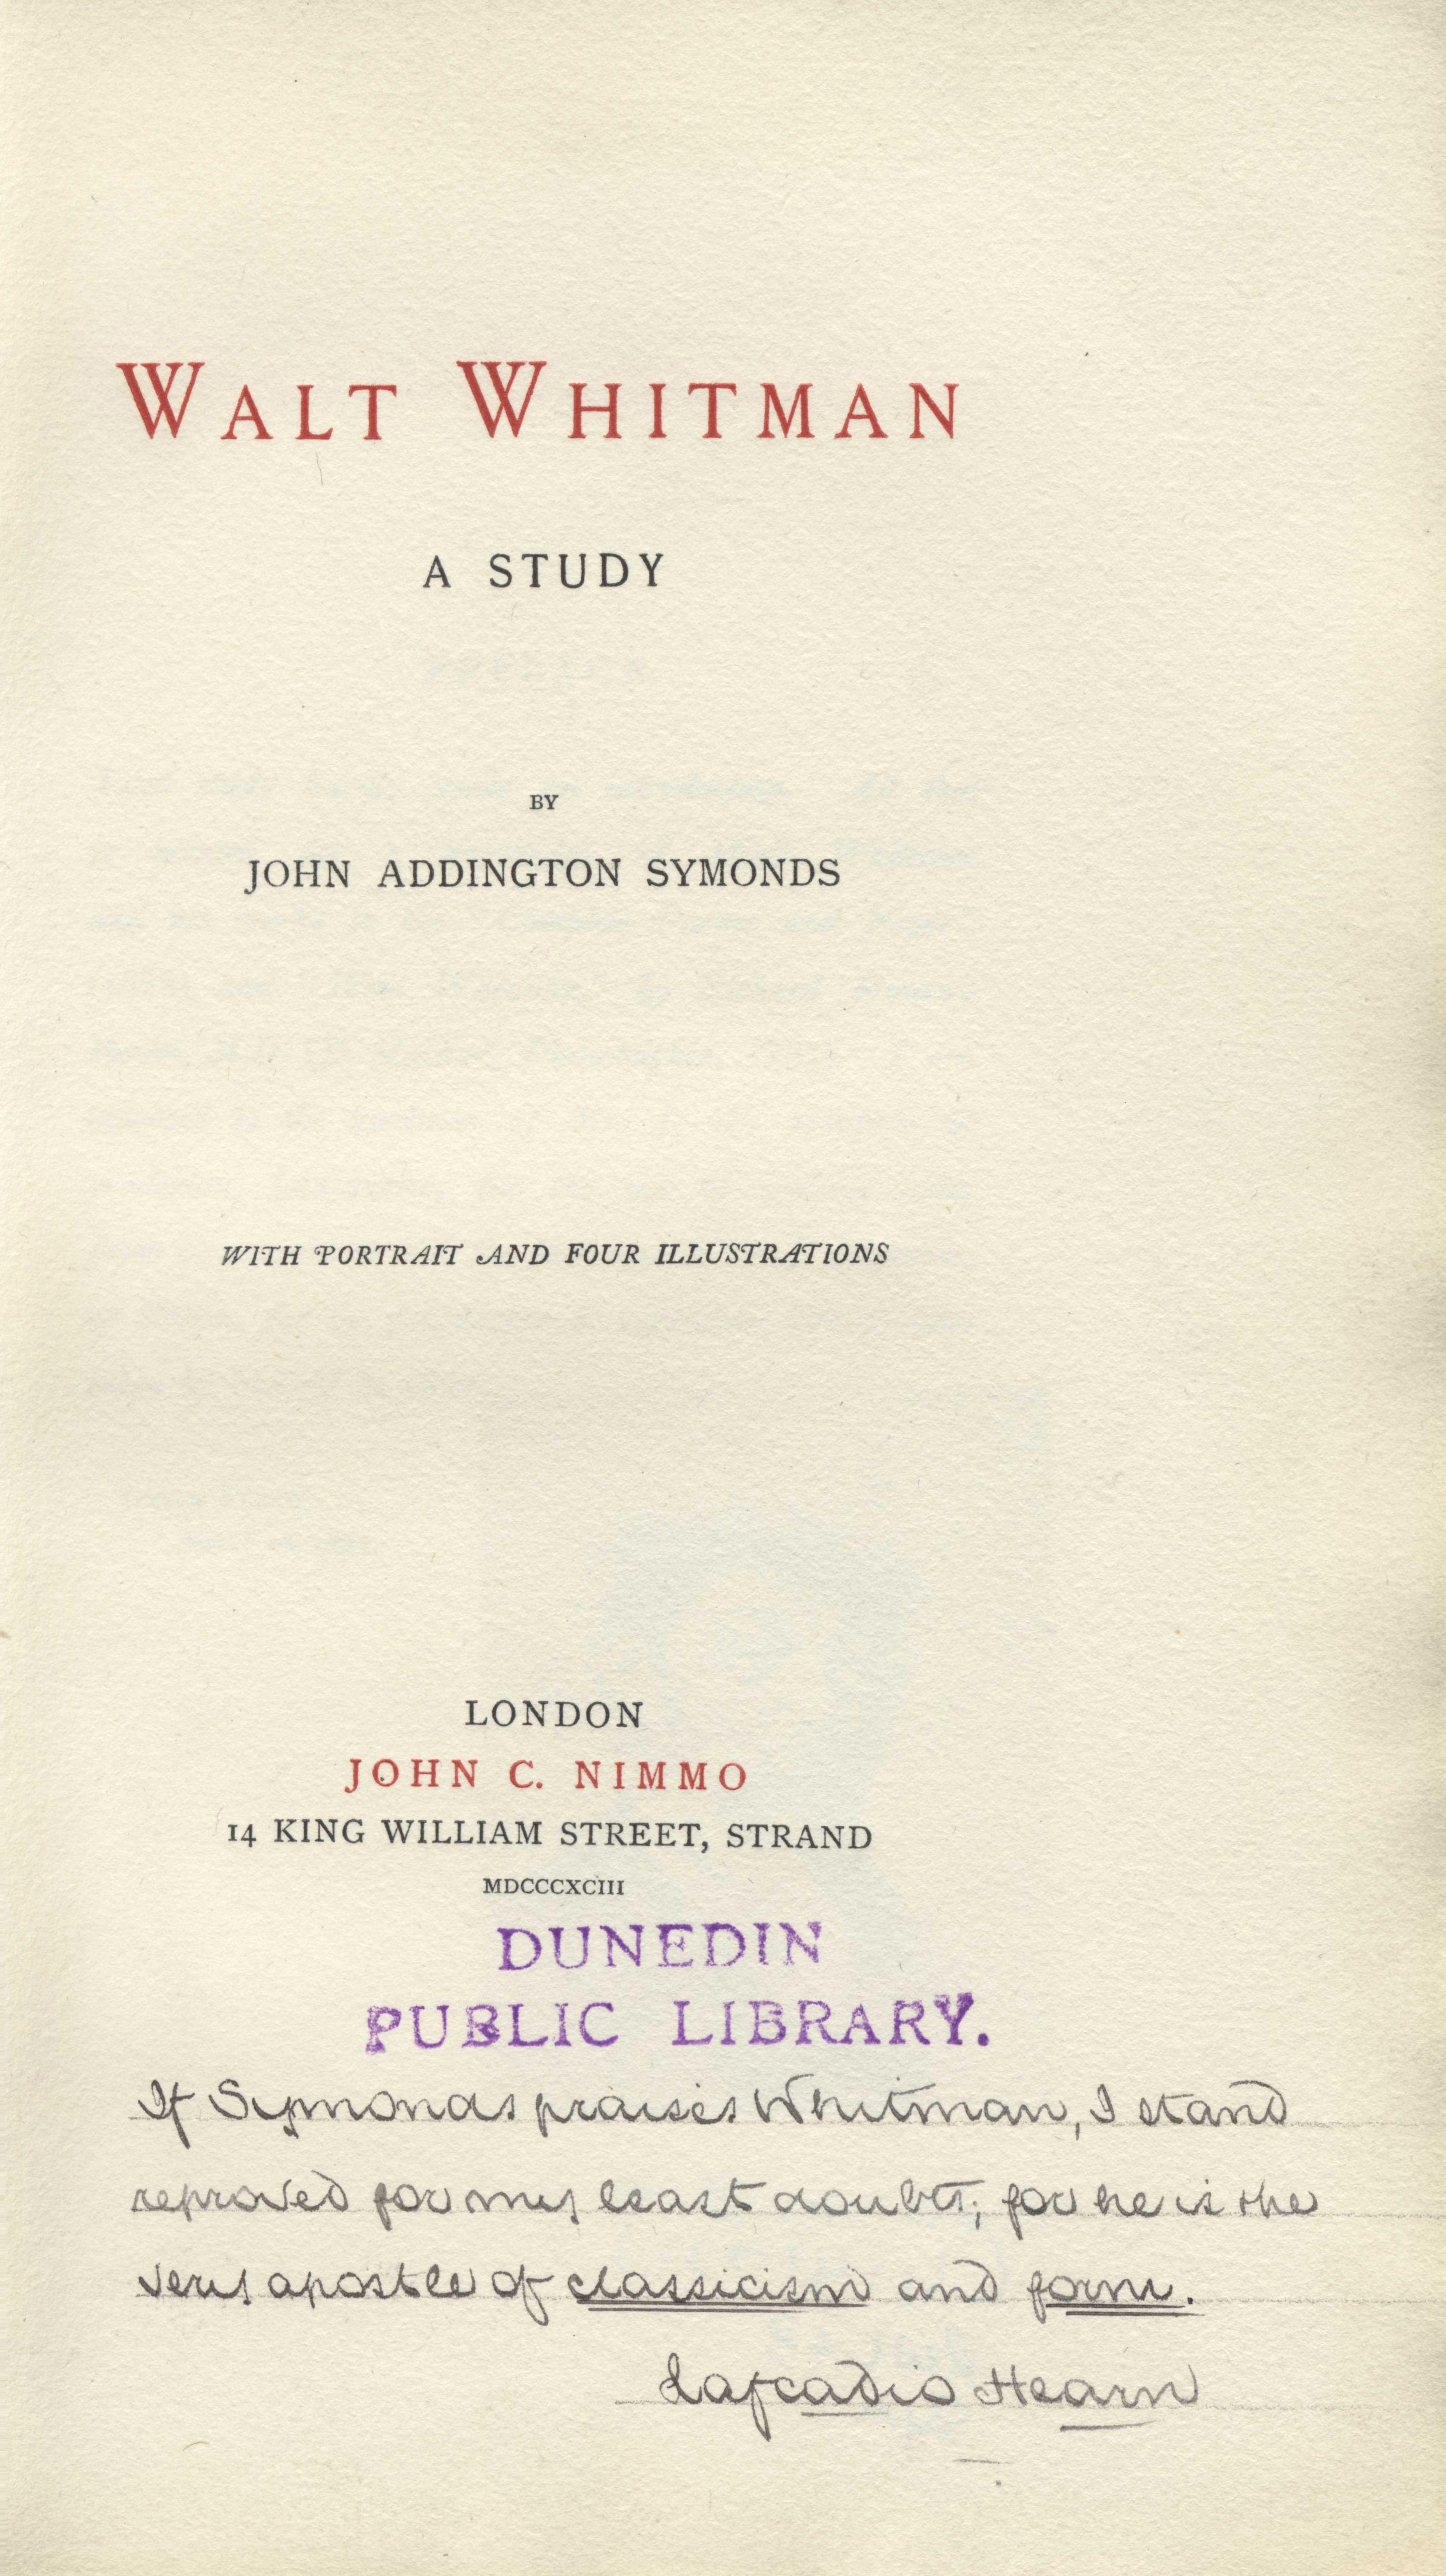 John Addington Symonds. Walt Whitman, A Study. London: John C. Nimmo, 1893.